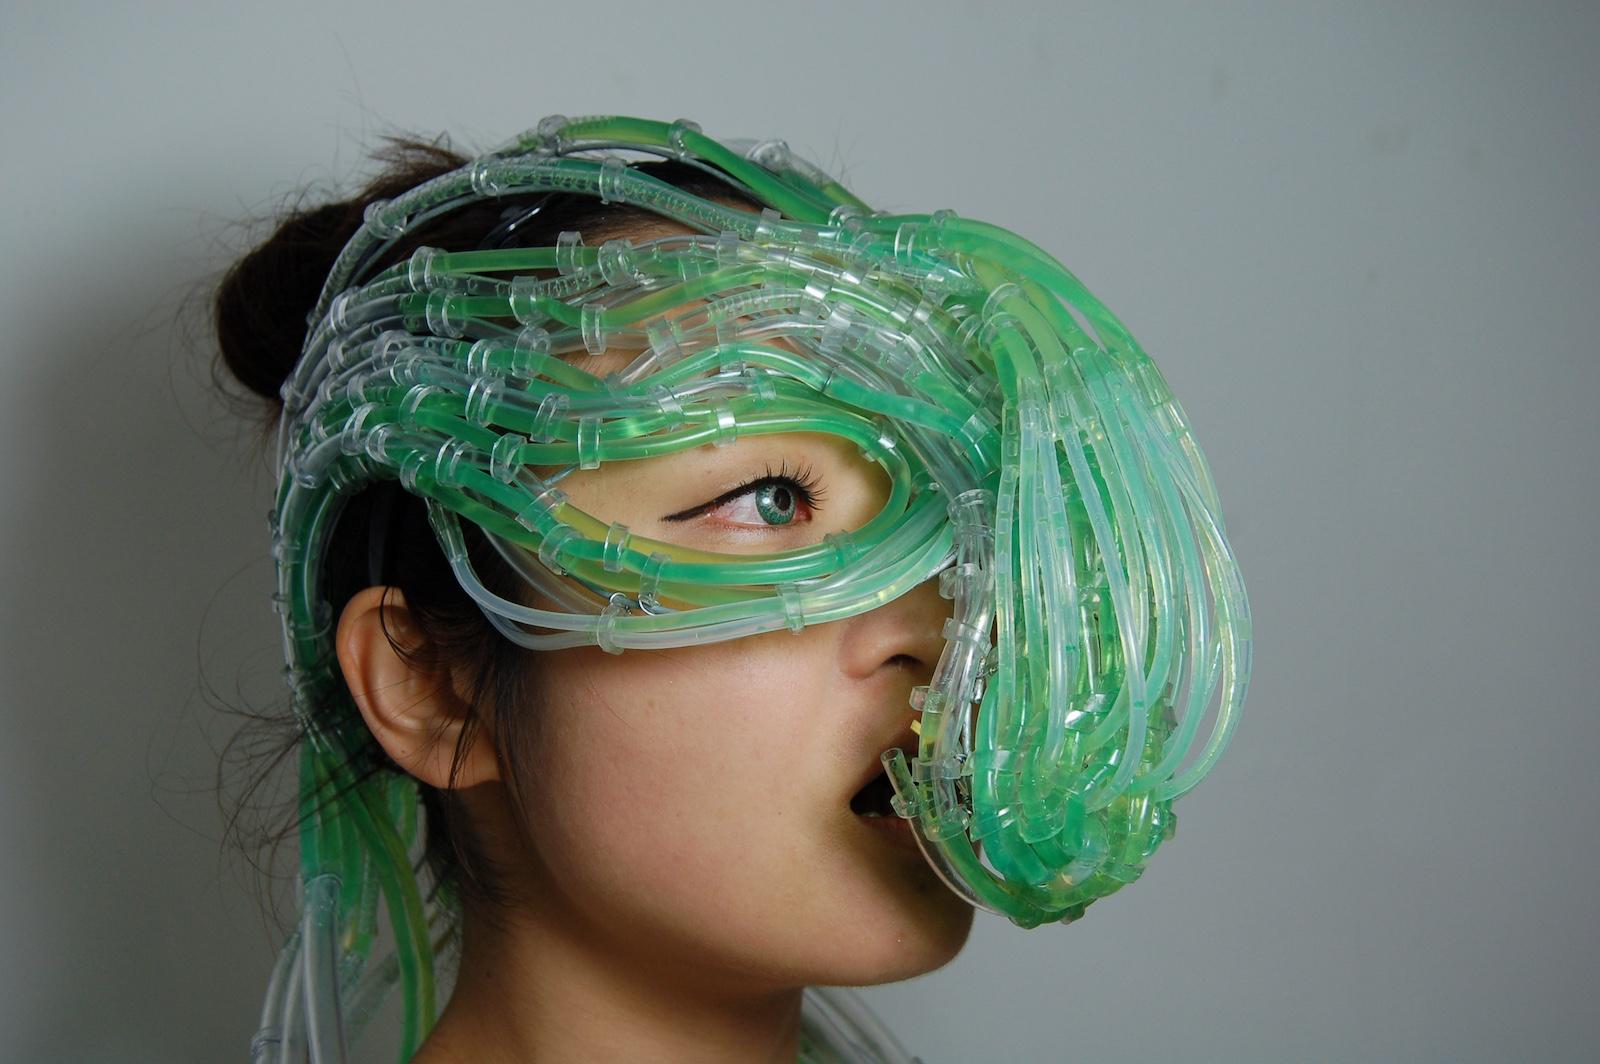 Near future algaculture symbiosis suit by London-based designers BurtonNitta.